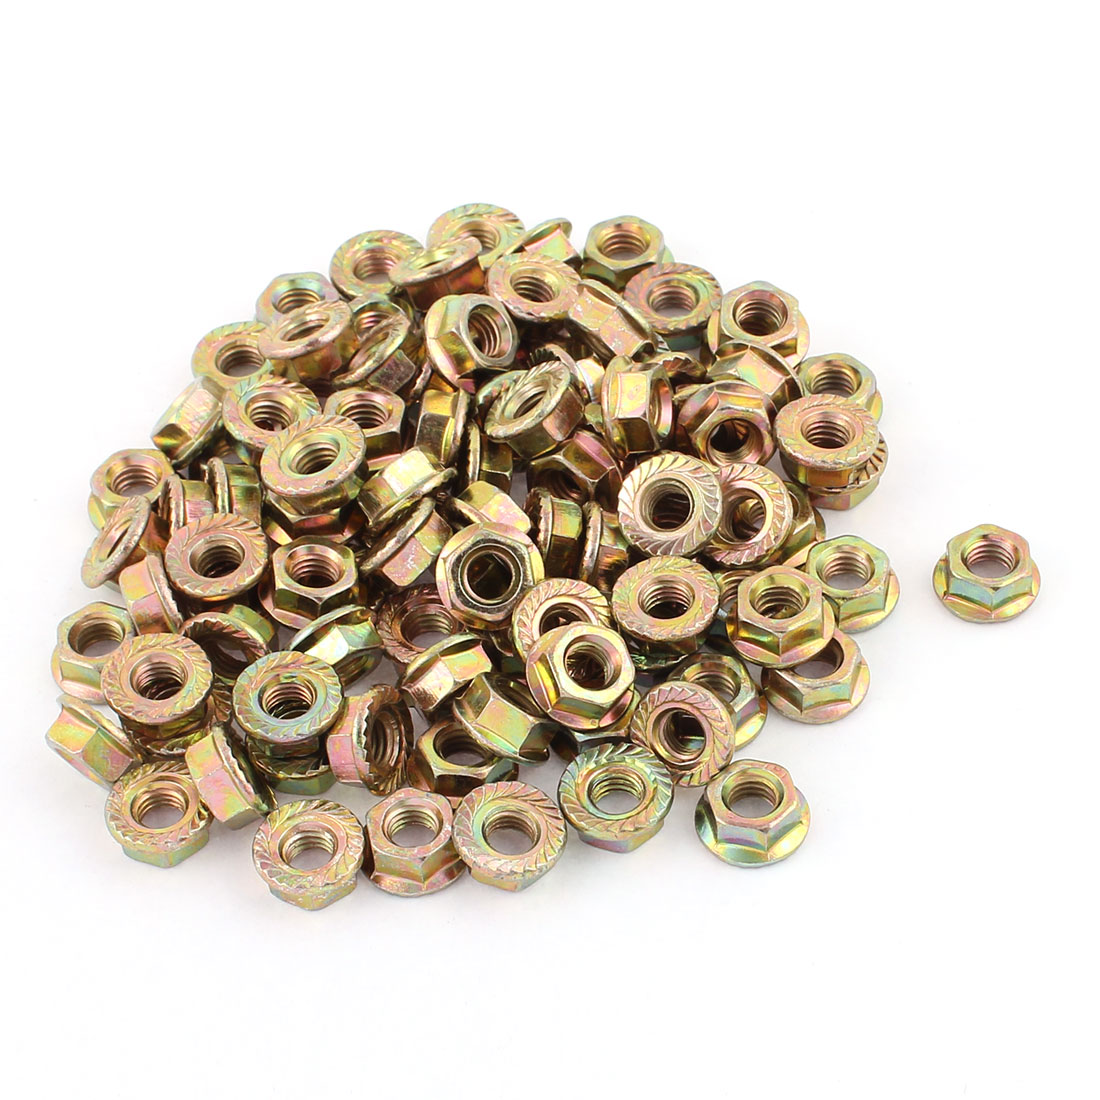 100PCS M6mm Thread Dia Stainless Steel Serrated Hex Flange Nuts Locknuts